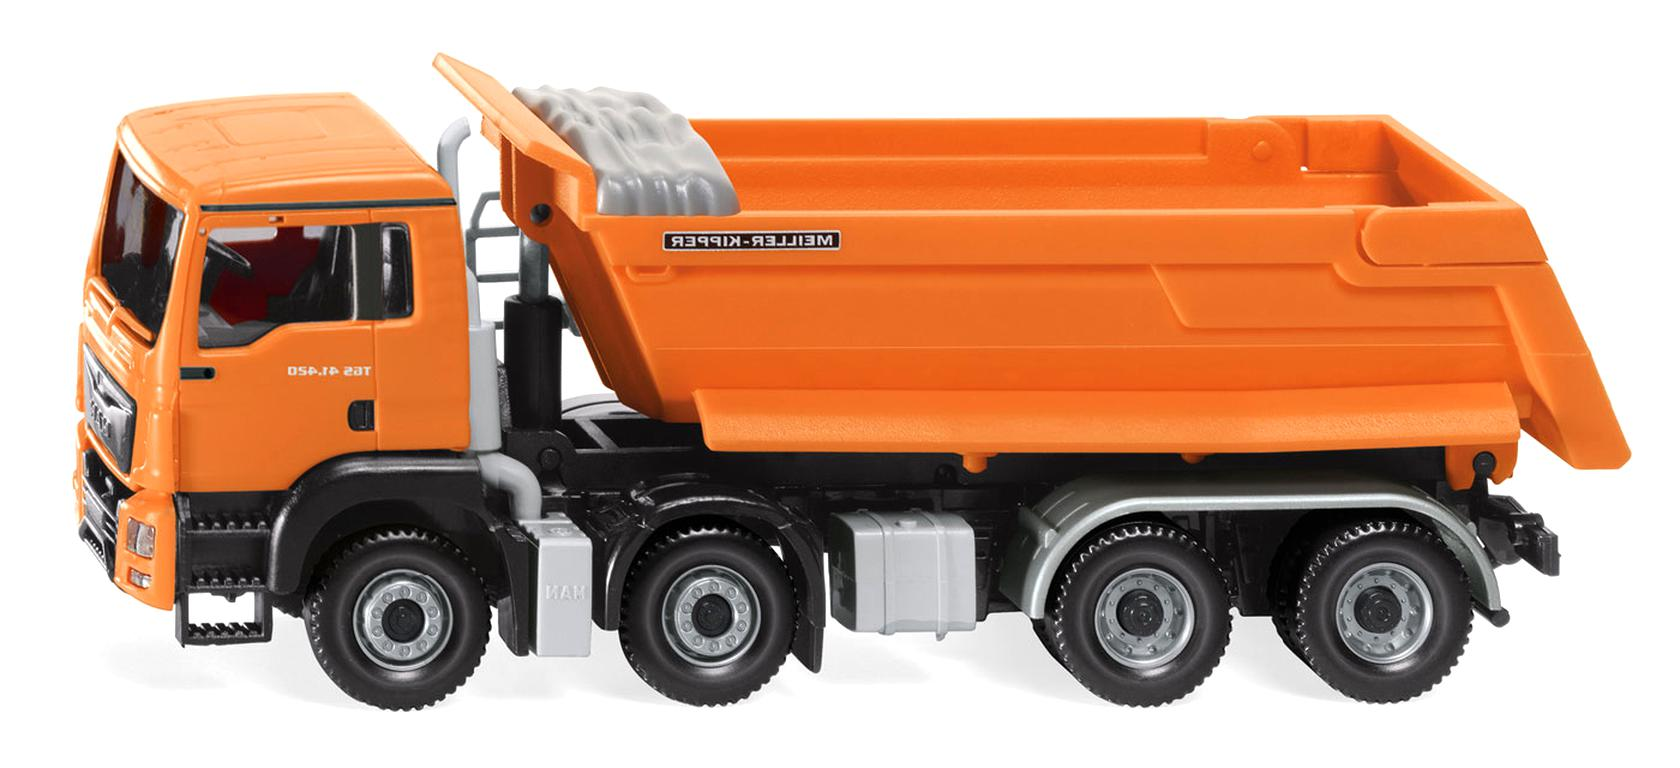 1//87 Wiking MAN Muldenkipper orange 671 1 A